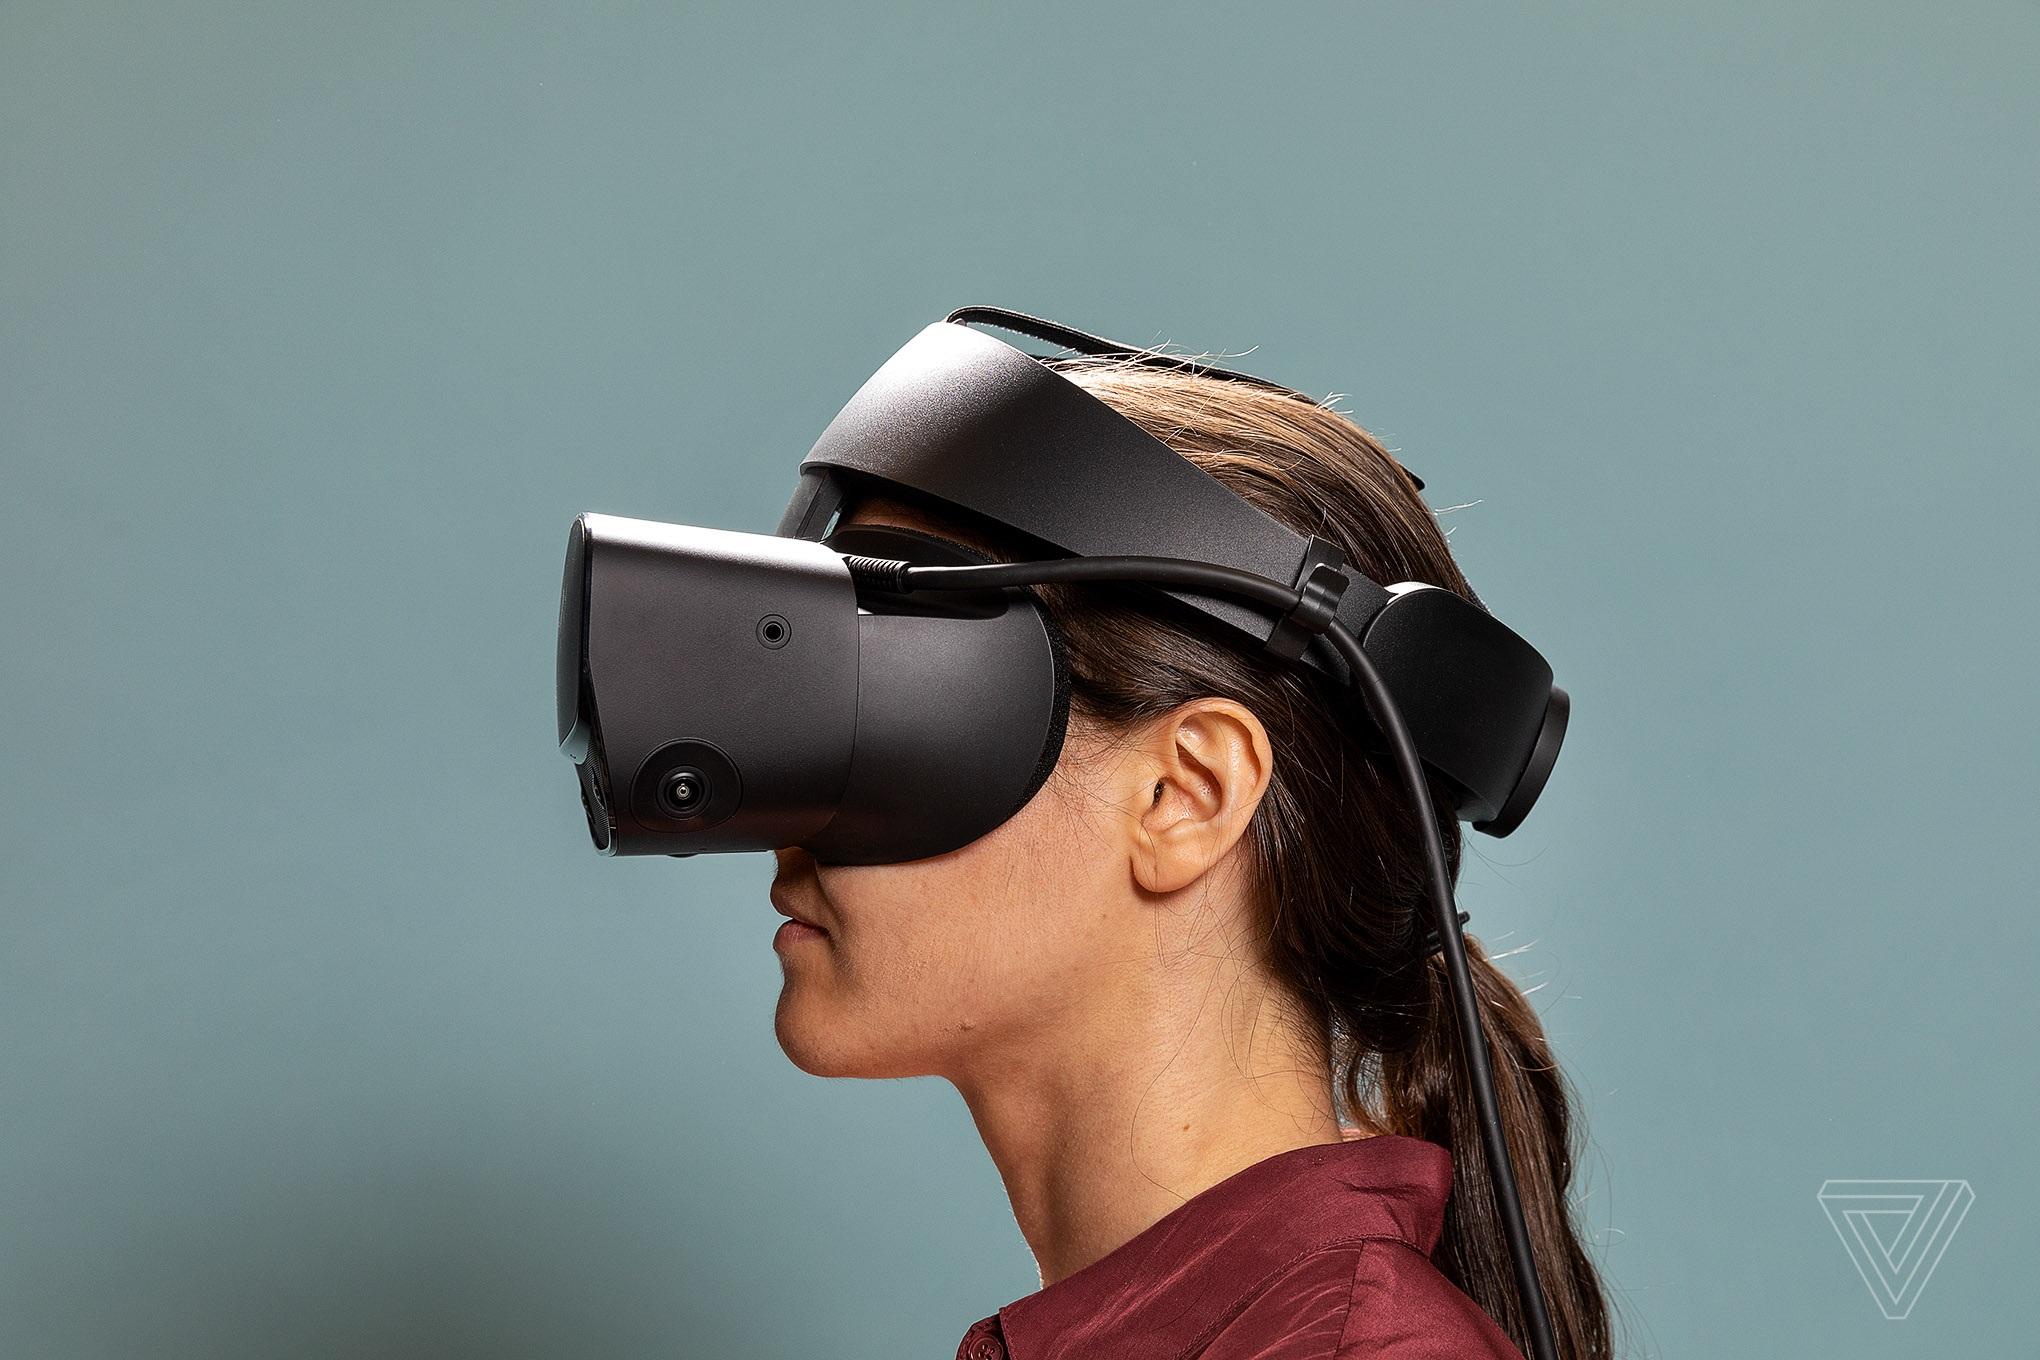 مشخصات هدست VR لنوو اعلام شد